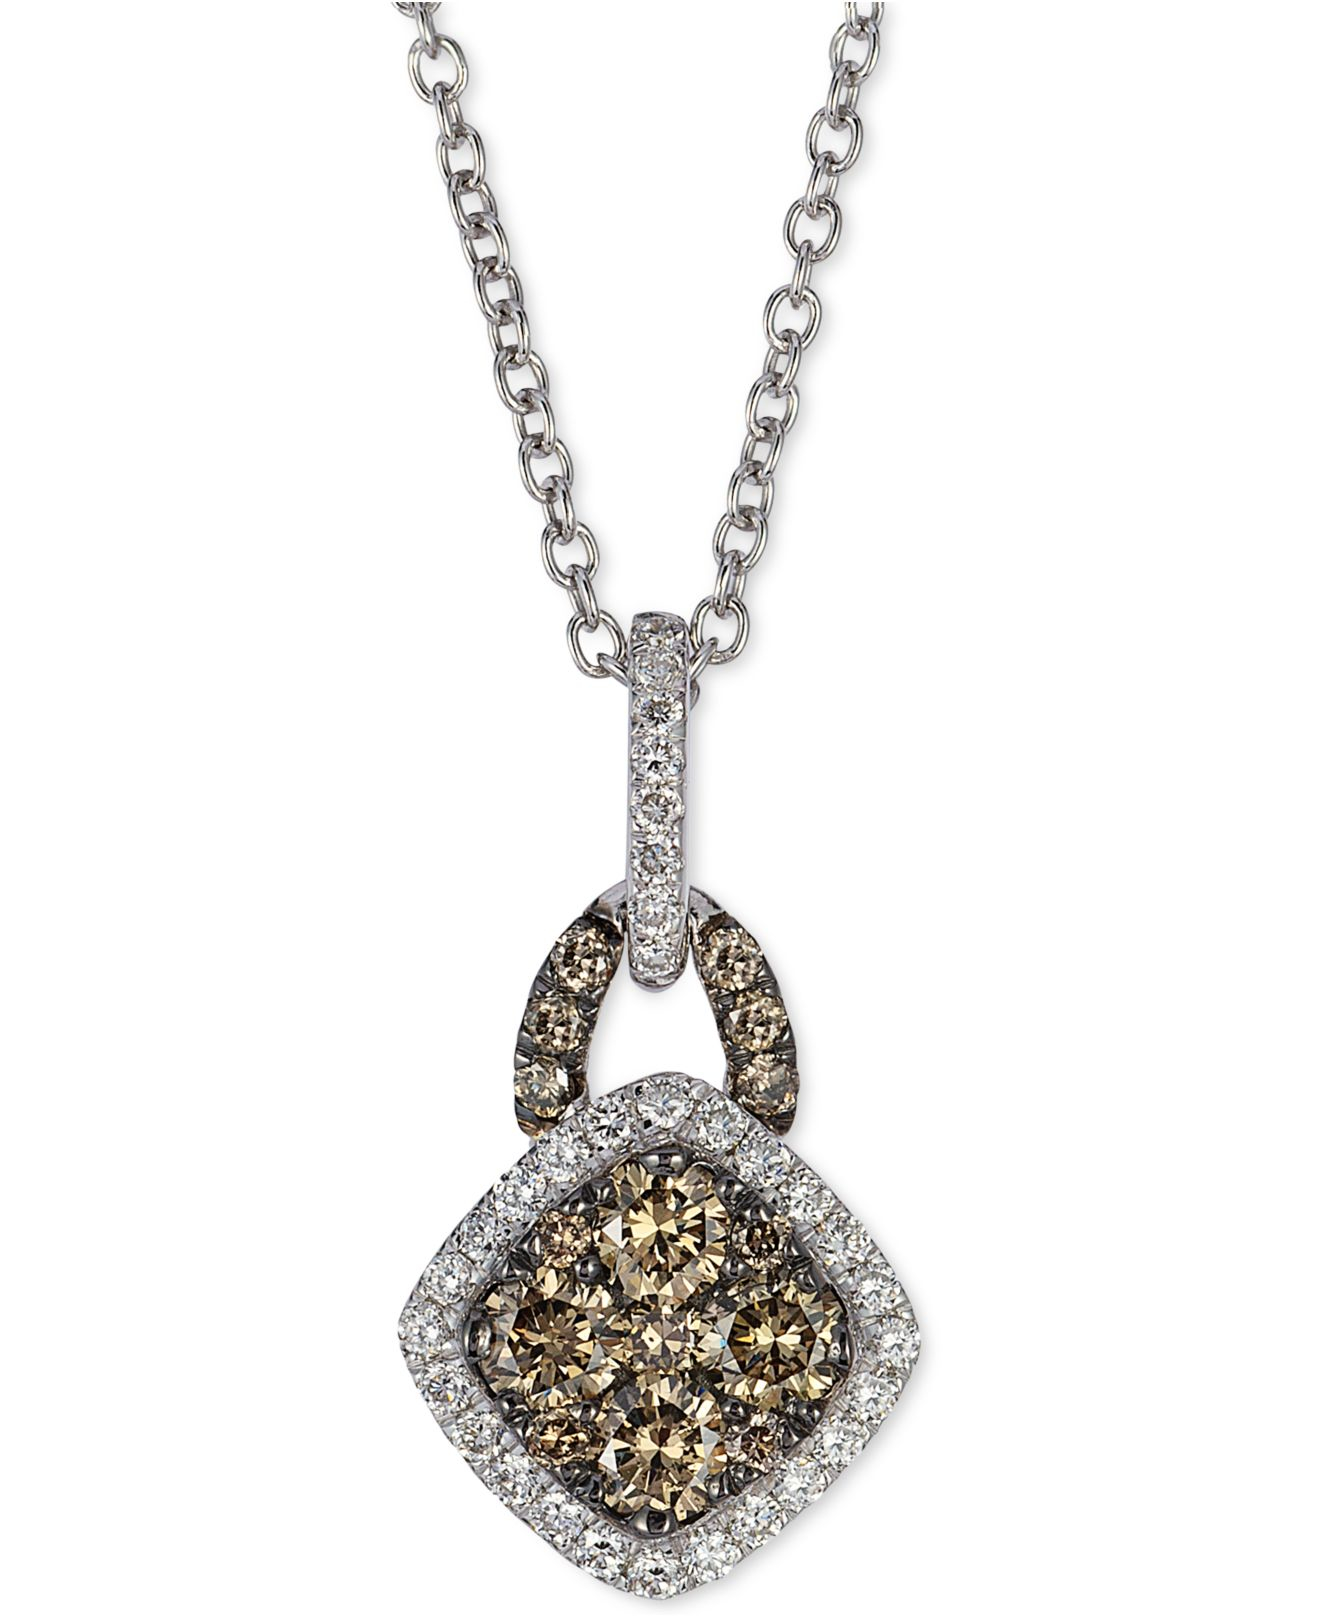 le vian white and chocolate diamond pendant necklace 3 8. Black Bedroom Furniture Sets. Home Design Ideas